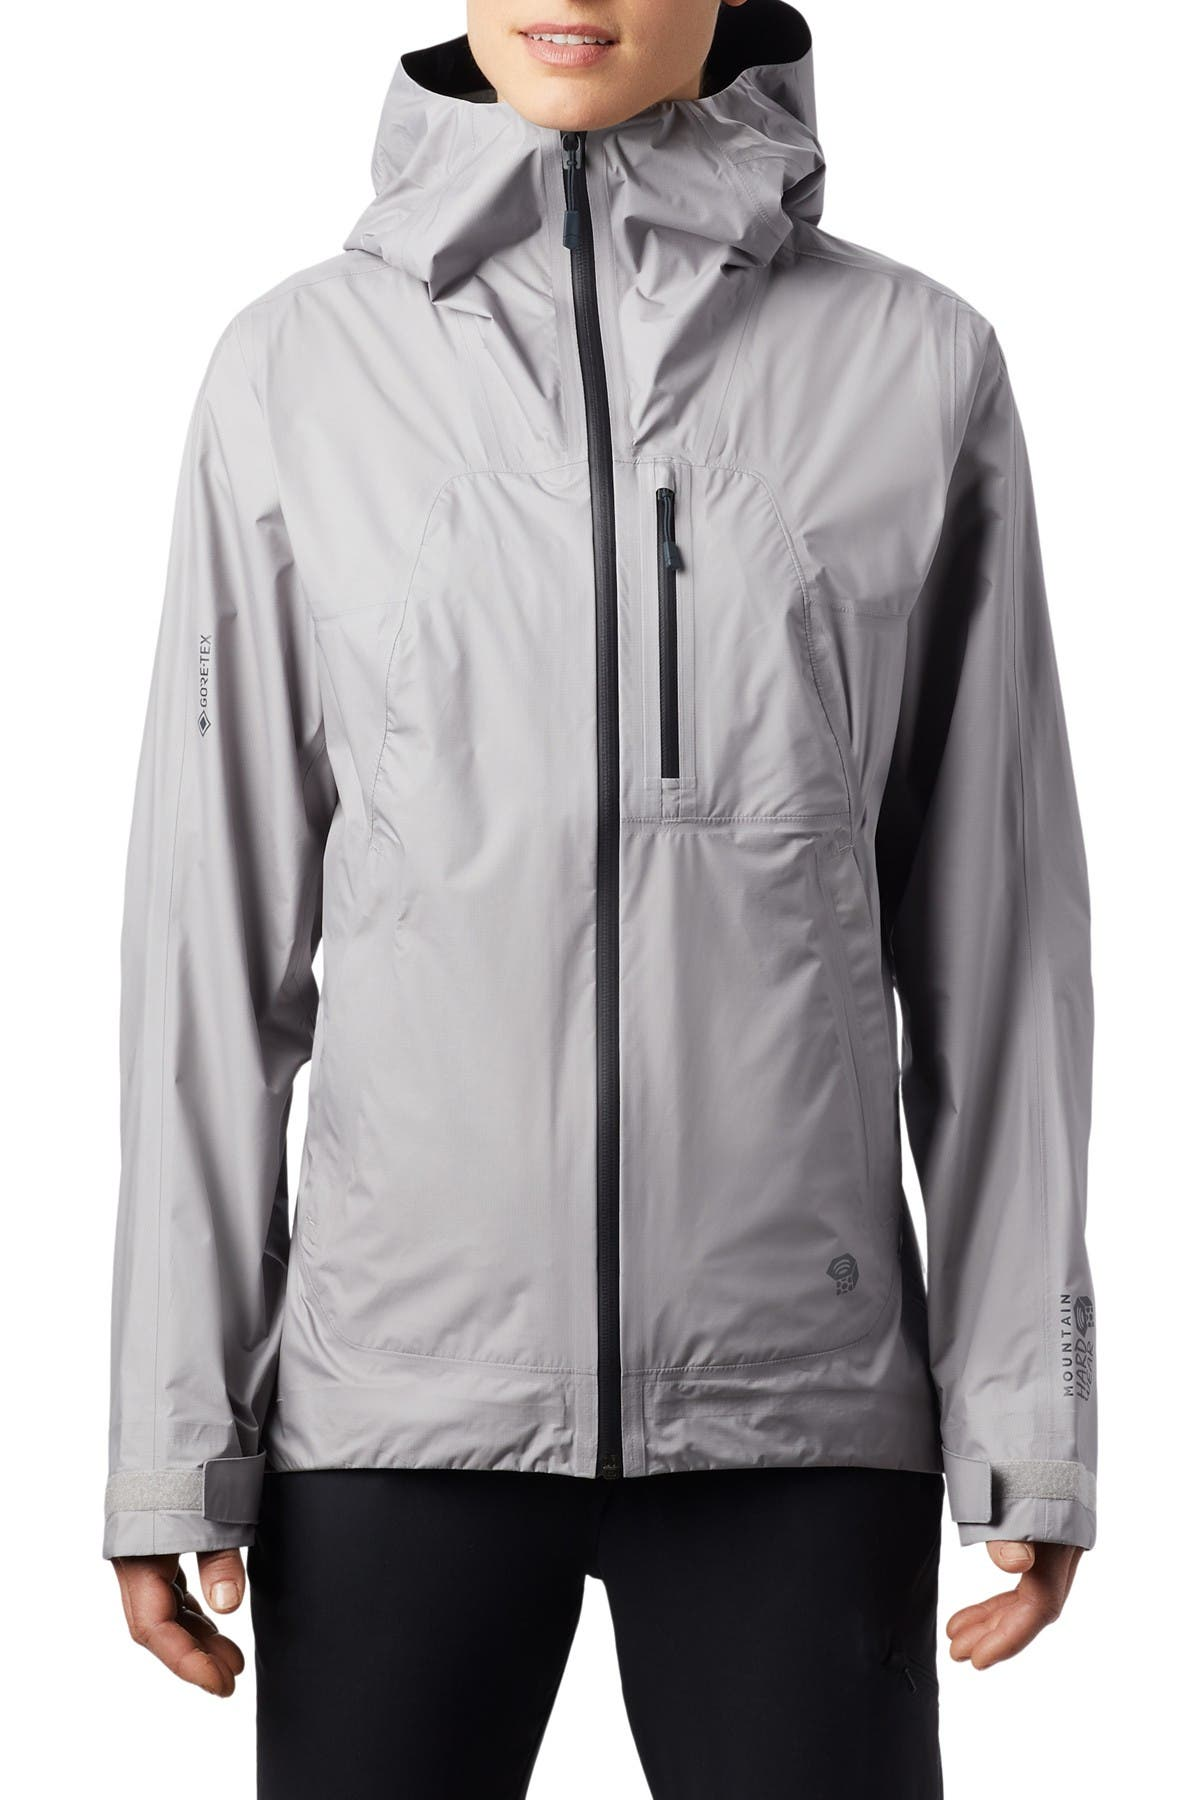 MOUNTAIN HARDWEAR Exposure/2™ Gore-Tex Paclite® Plus Jacket